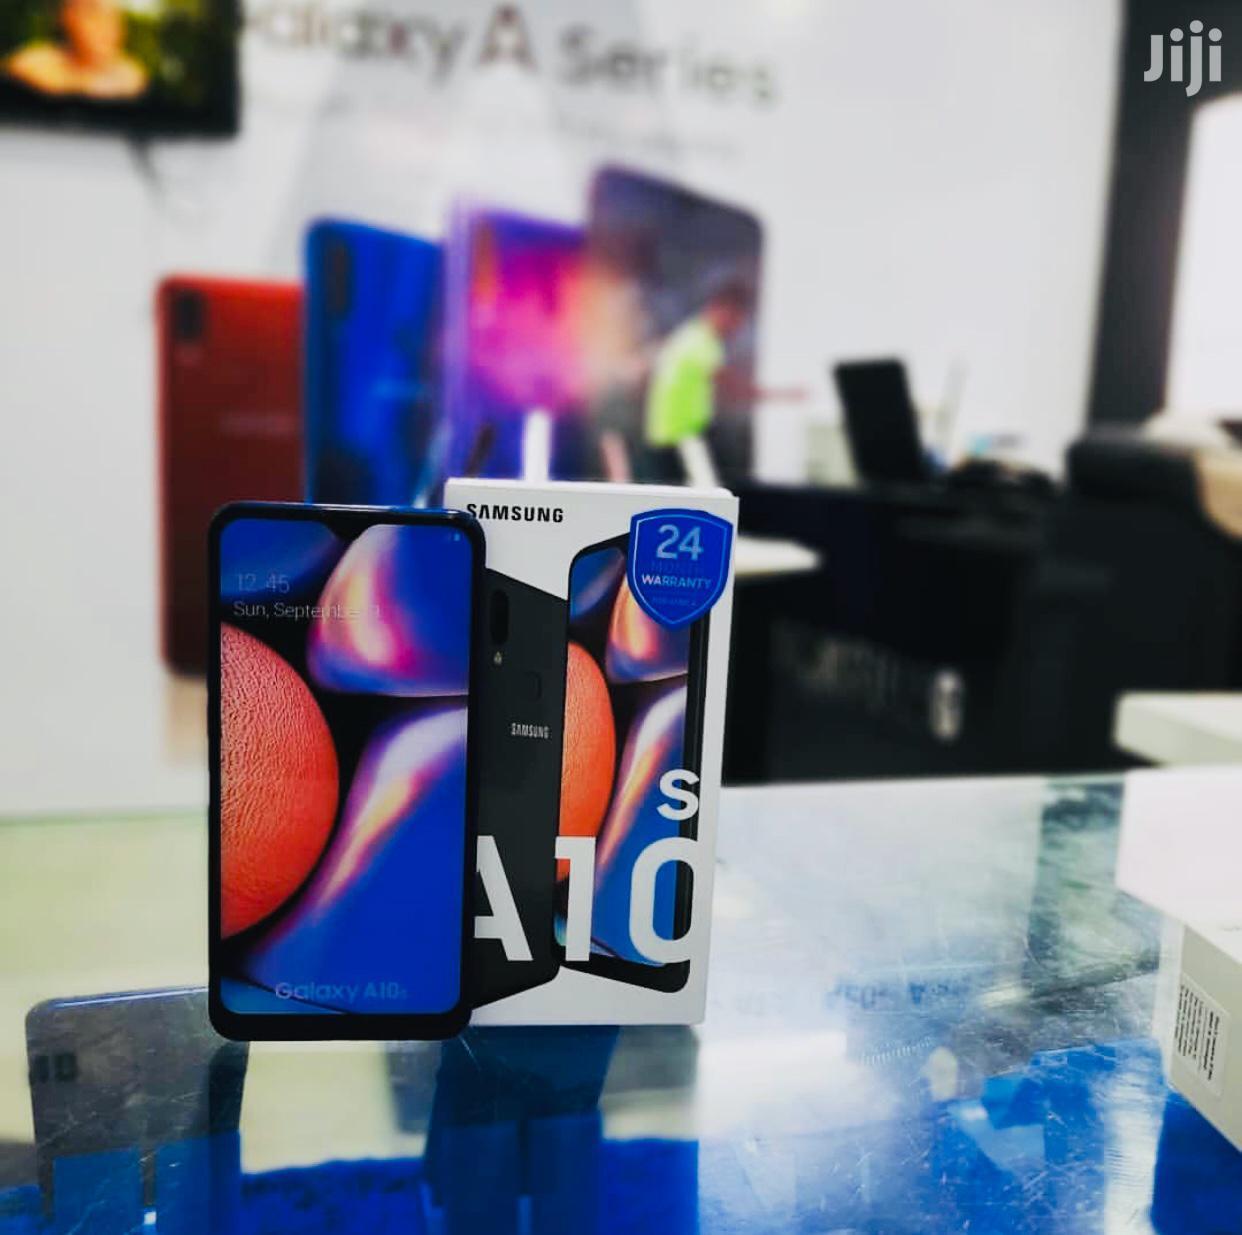 Archive: New Samsung Galaxy A10s 32 GB